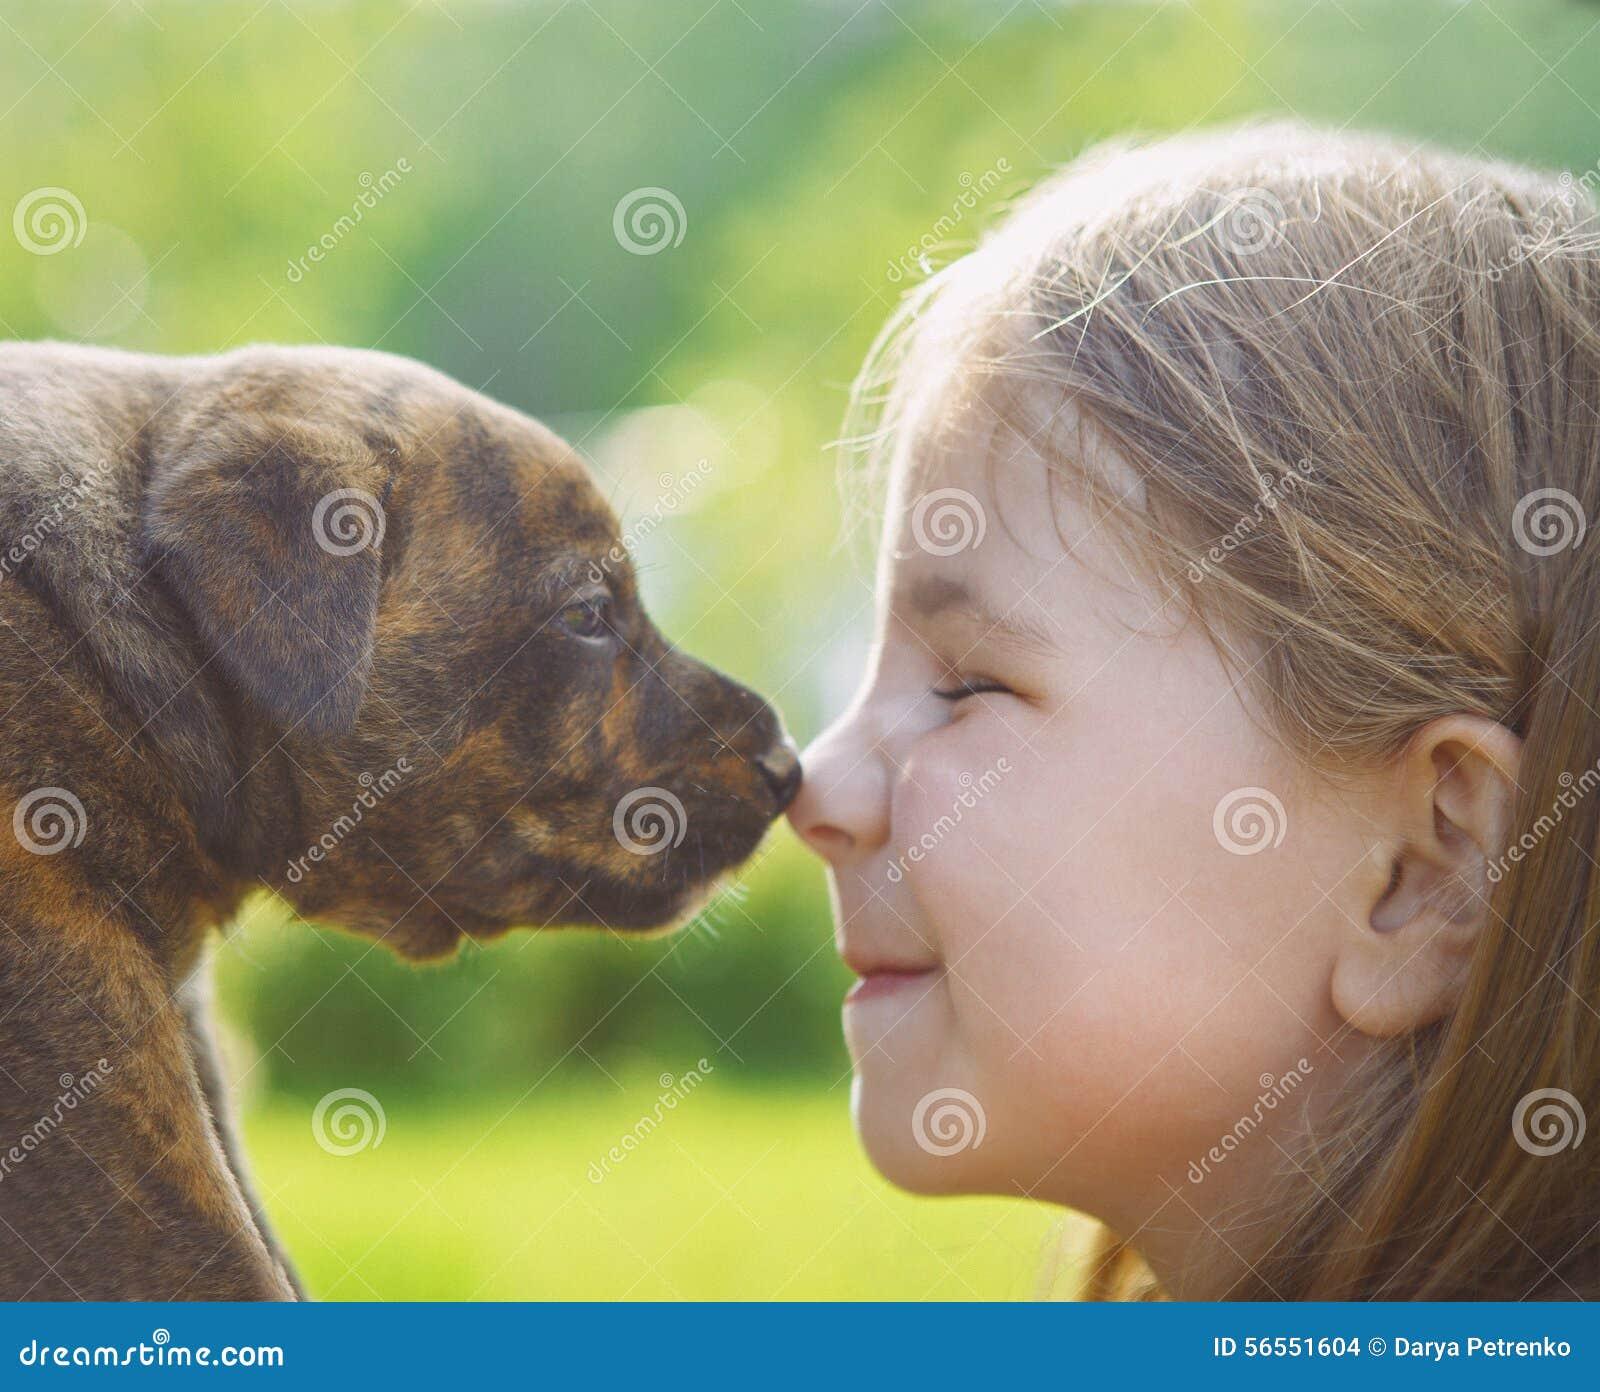 Download Μικρό κορίτσι με ένα κουτάβι Στοκ Εικόνες - εικόνα από κορίτσι, τρίχωμα: 56551604